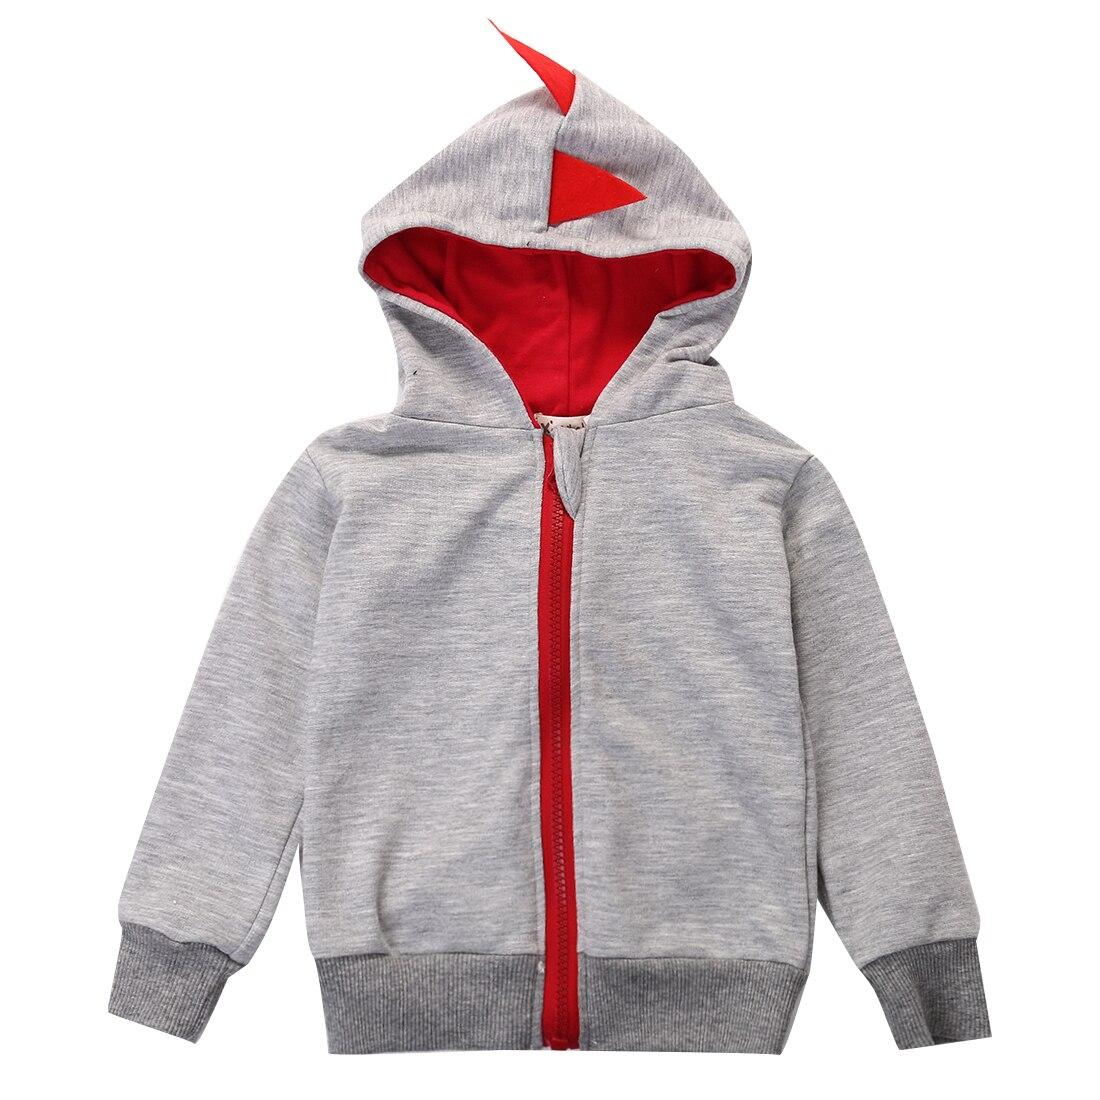 black-and-gray-new-cute-hot-Baby-Boys-Fleece-Jumper-Zipper-Plain-Zip-Up-Dinosaur-Hoodie-Hooded-1